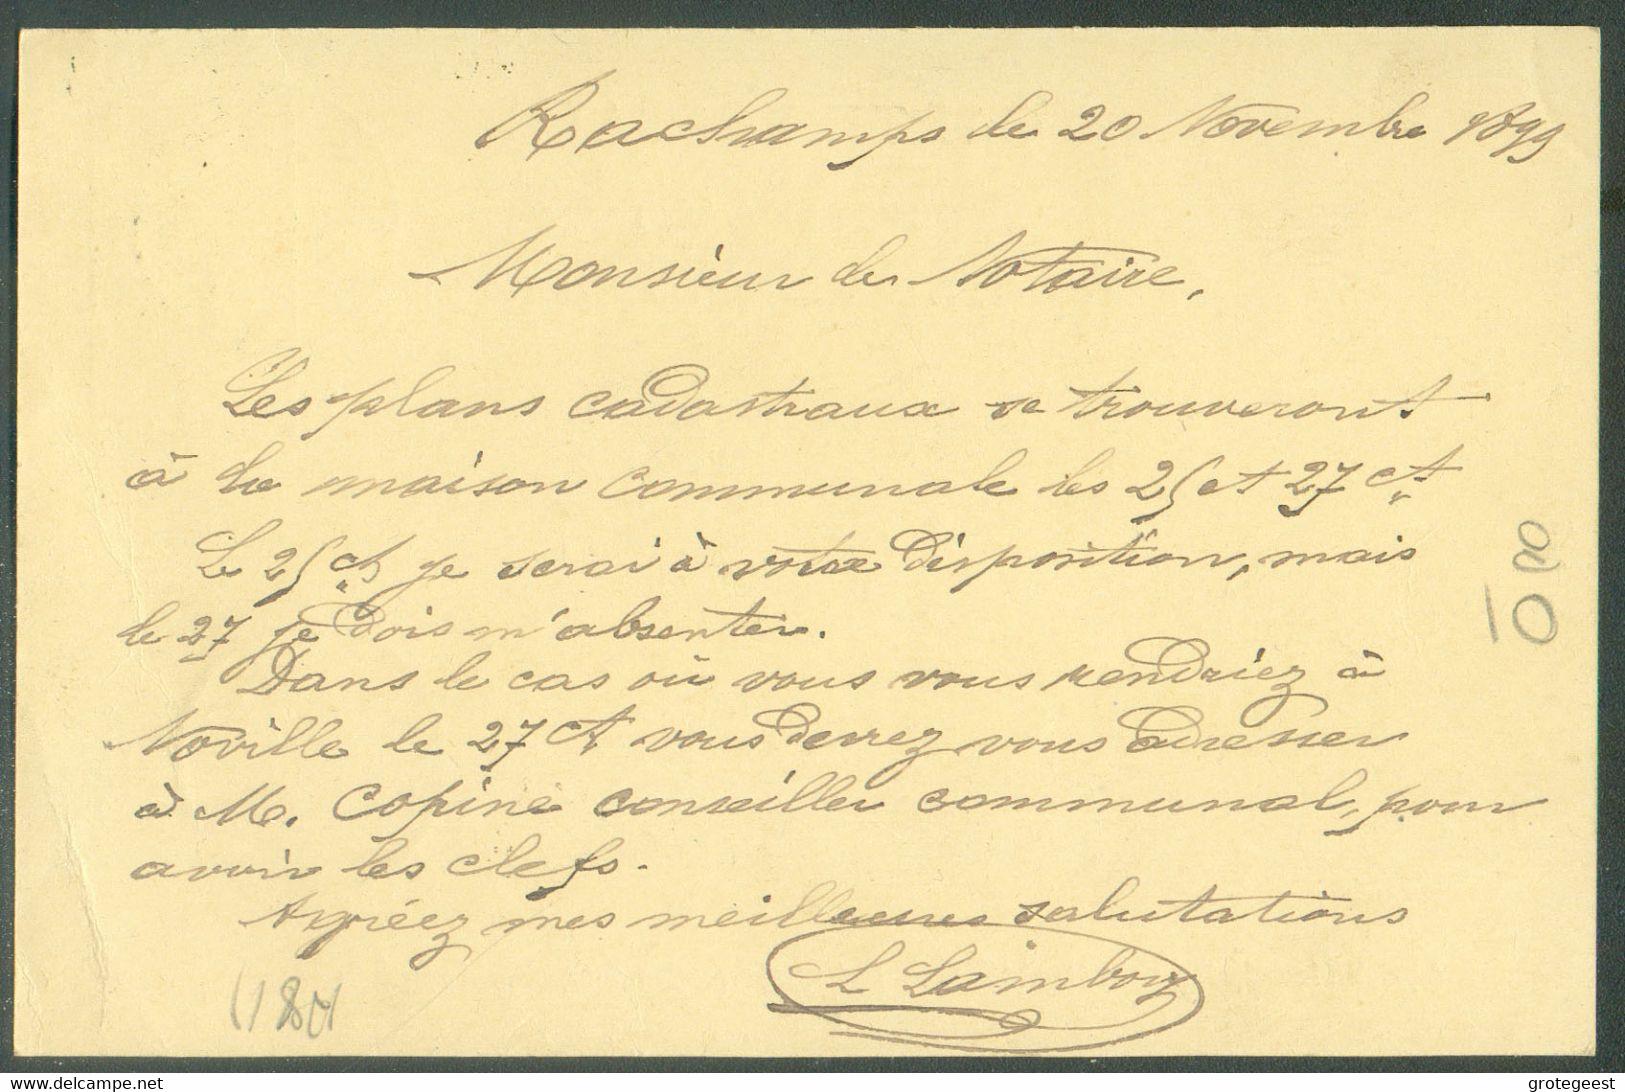 E.P. Carte 5 Centimes Datée De RACHAMPSet Obl. Sc Relais DeBOURCY (LONGWILLY)* 21 Novembre 1899 Vers Sibret. TB - - Cartoline [1871-09]